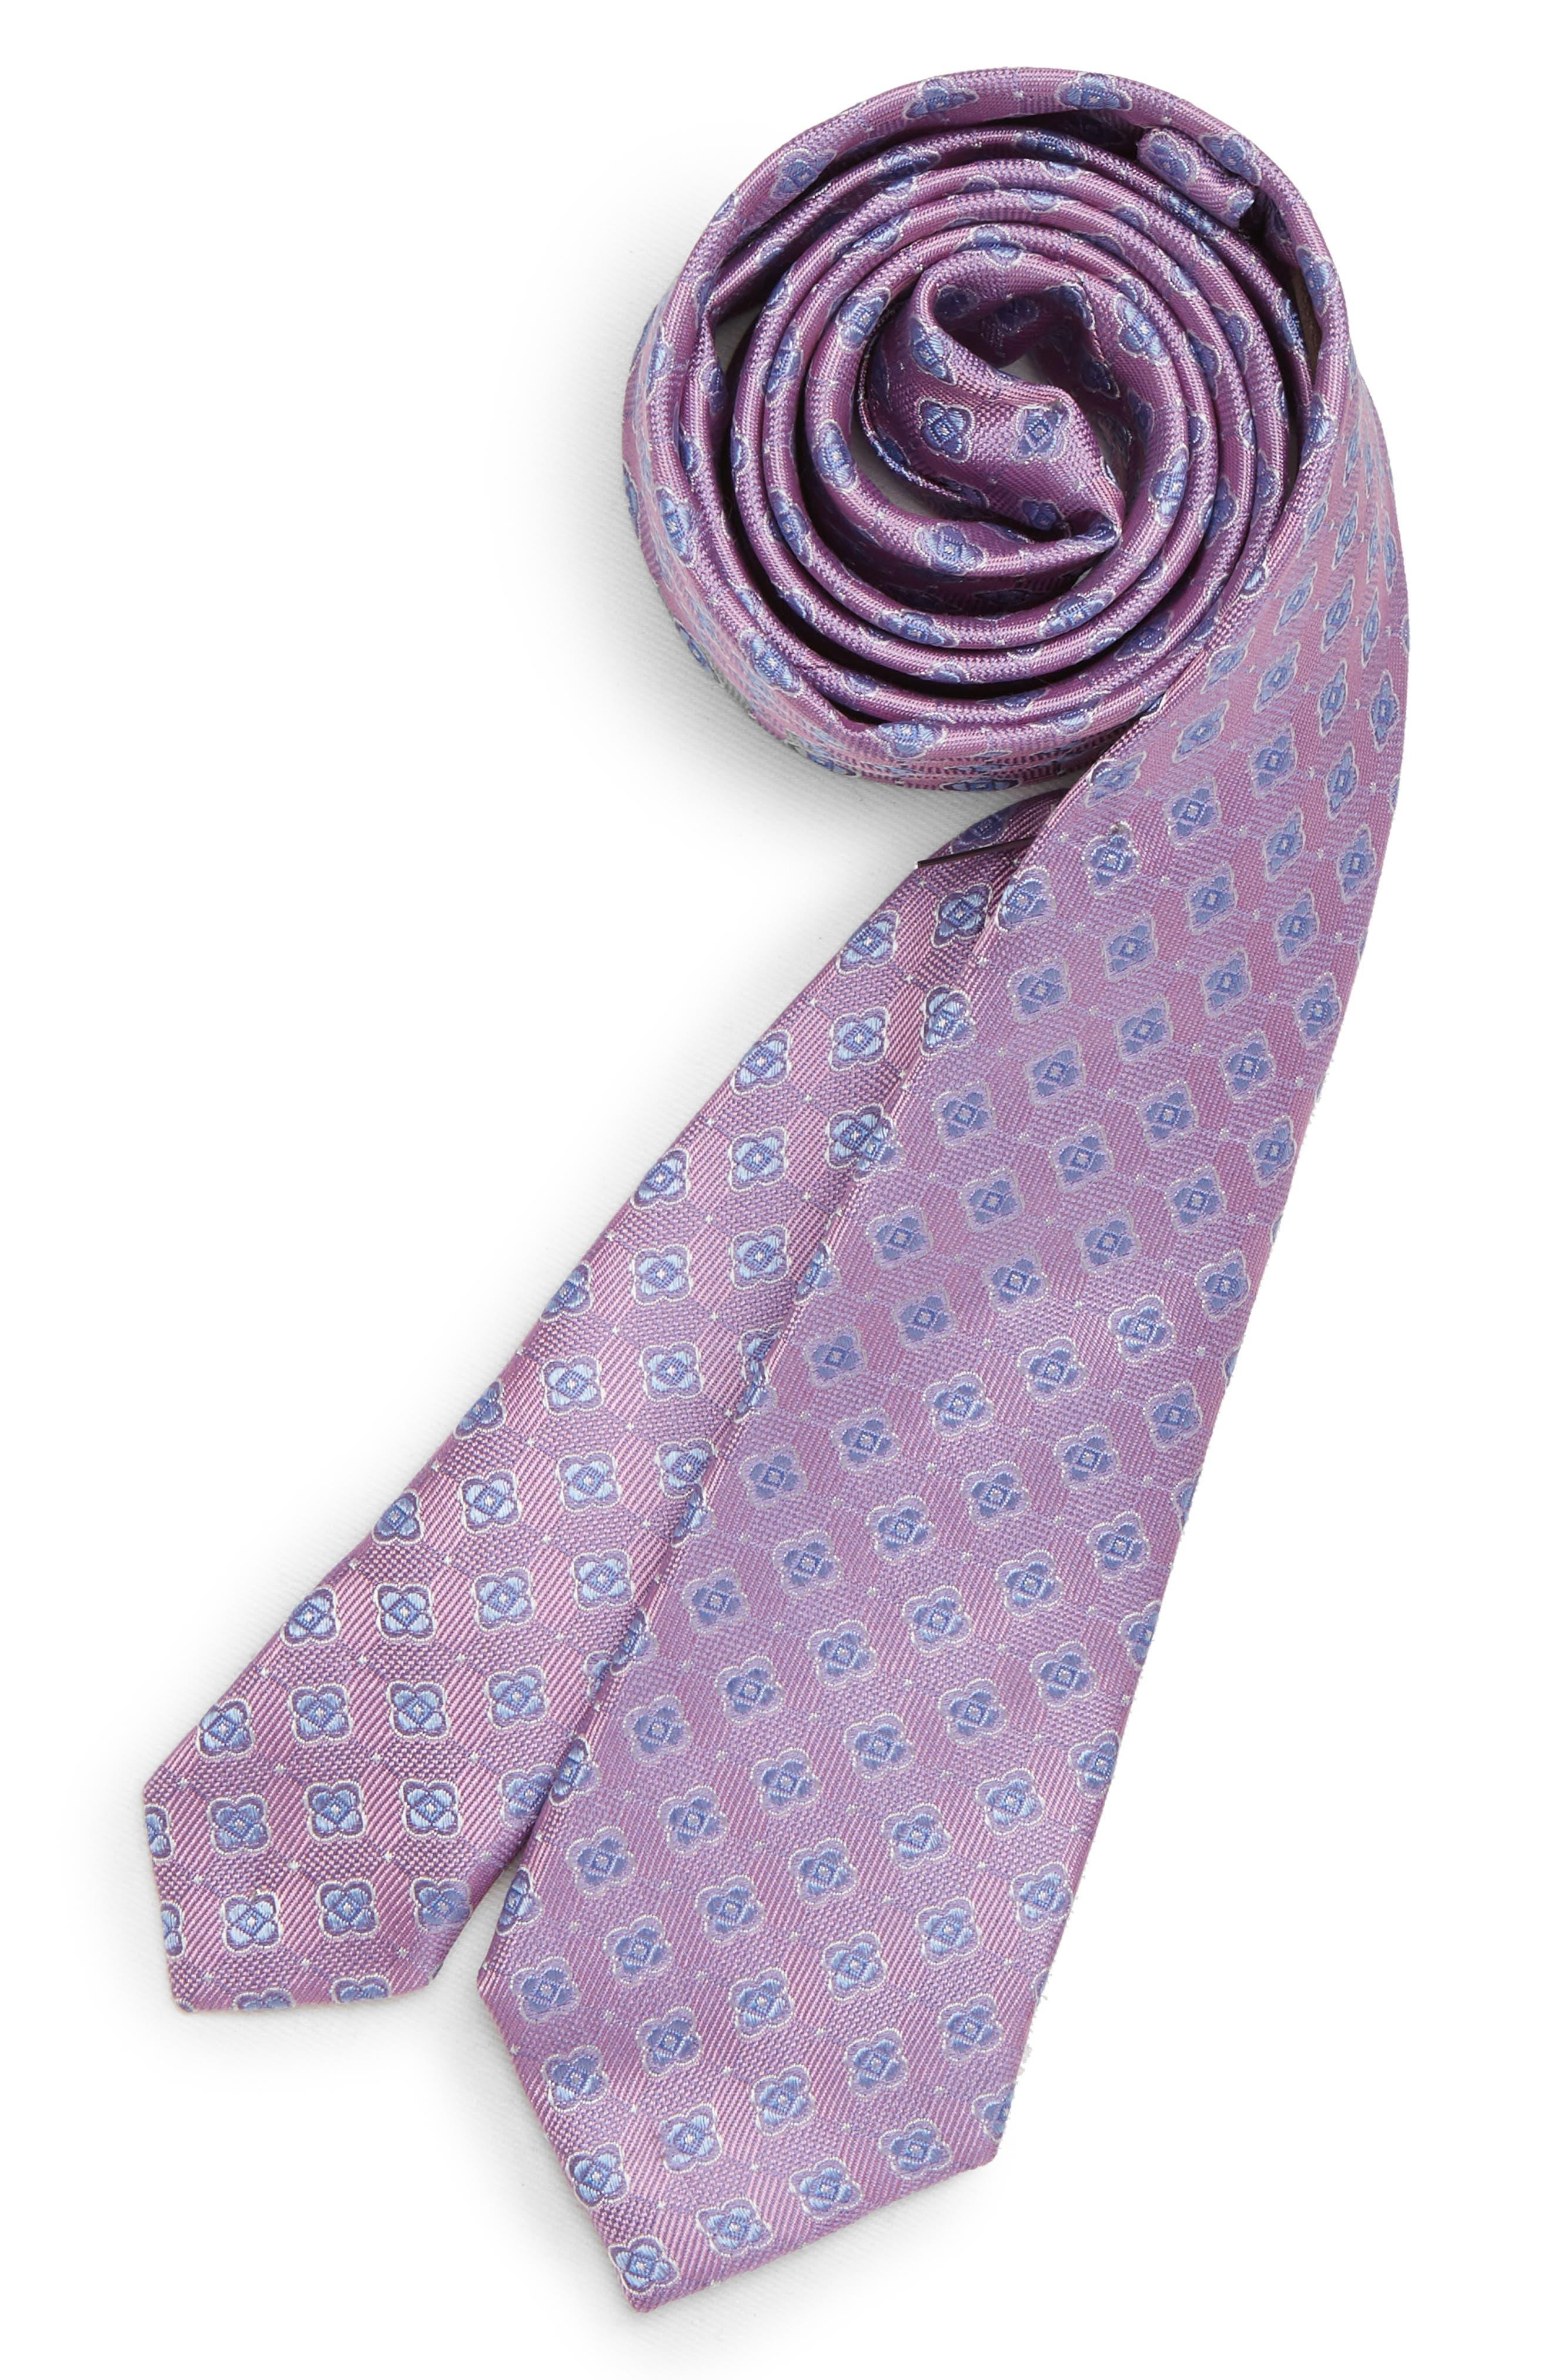 MICHAEL KORS,                             Medallion Silk Tie,                             Main thumbnail 1, color,                             650